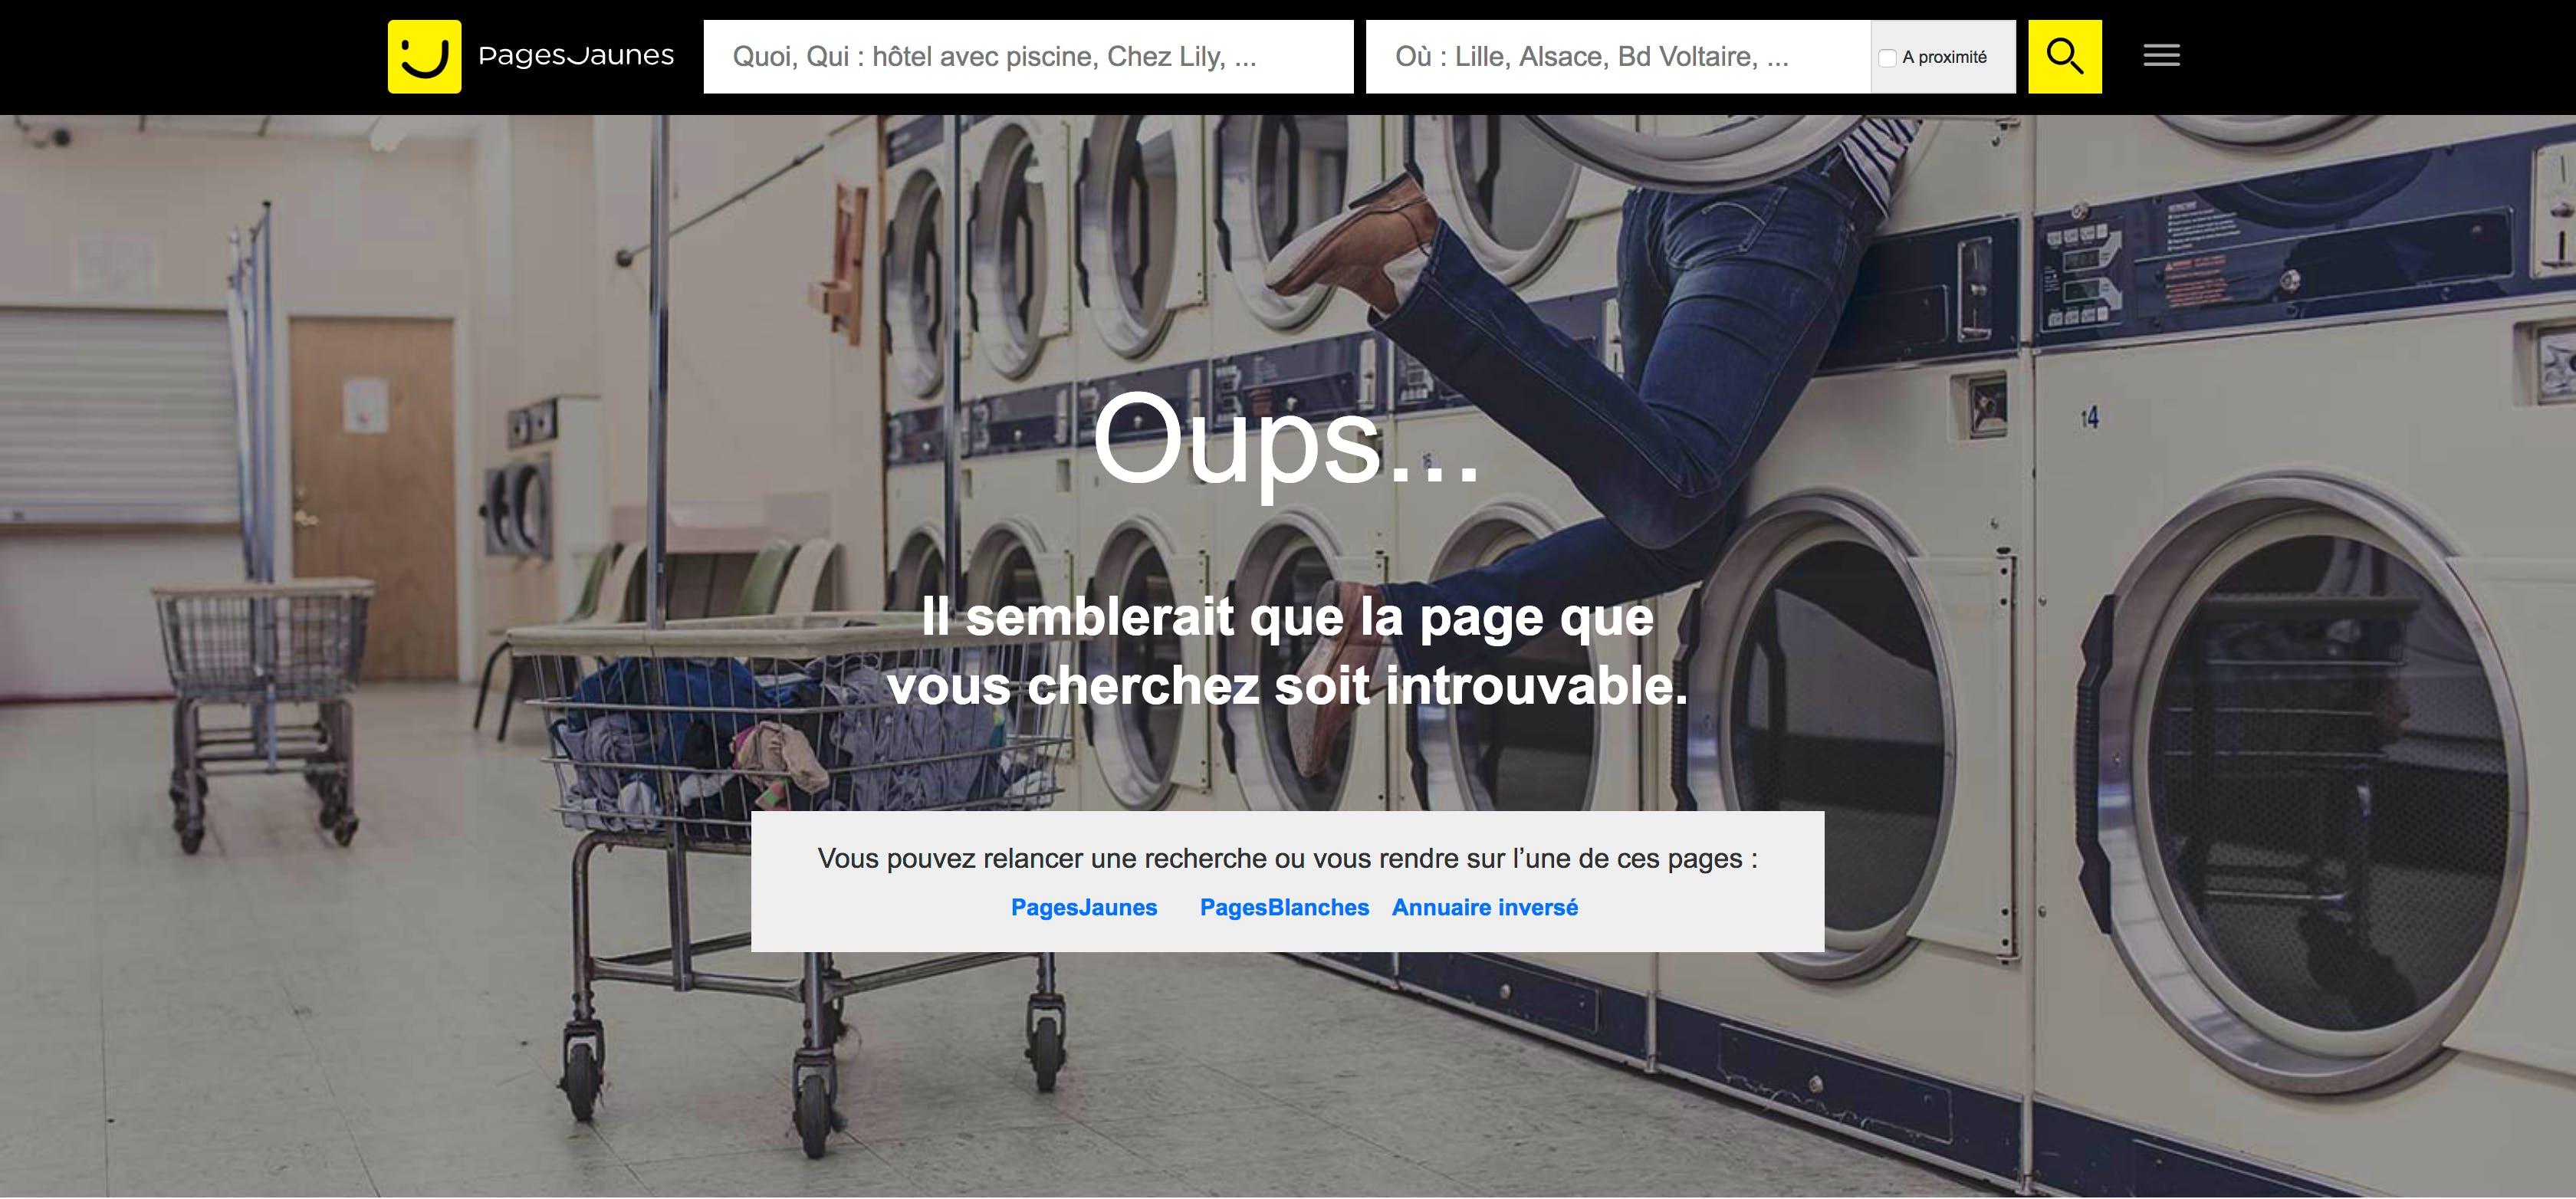 404 error page france